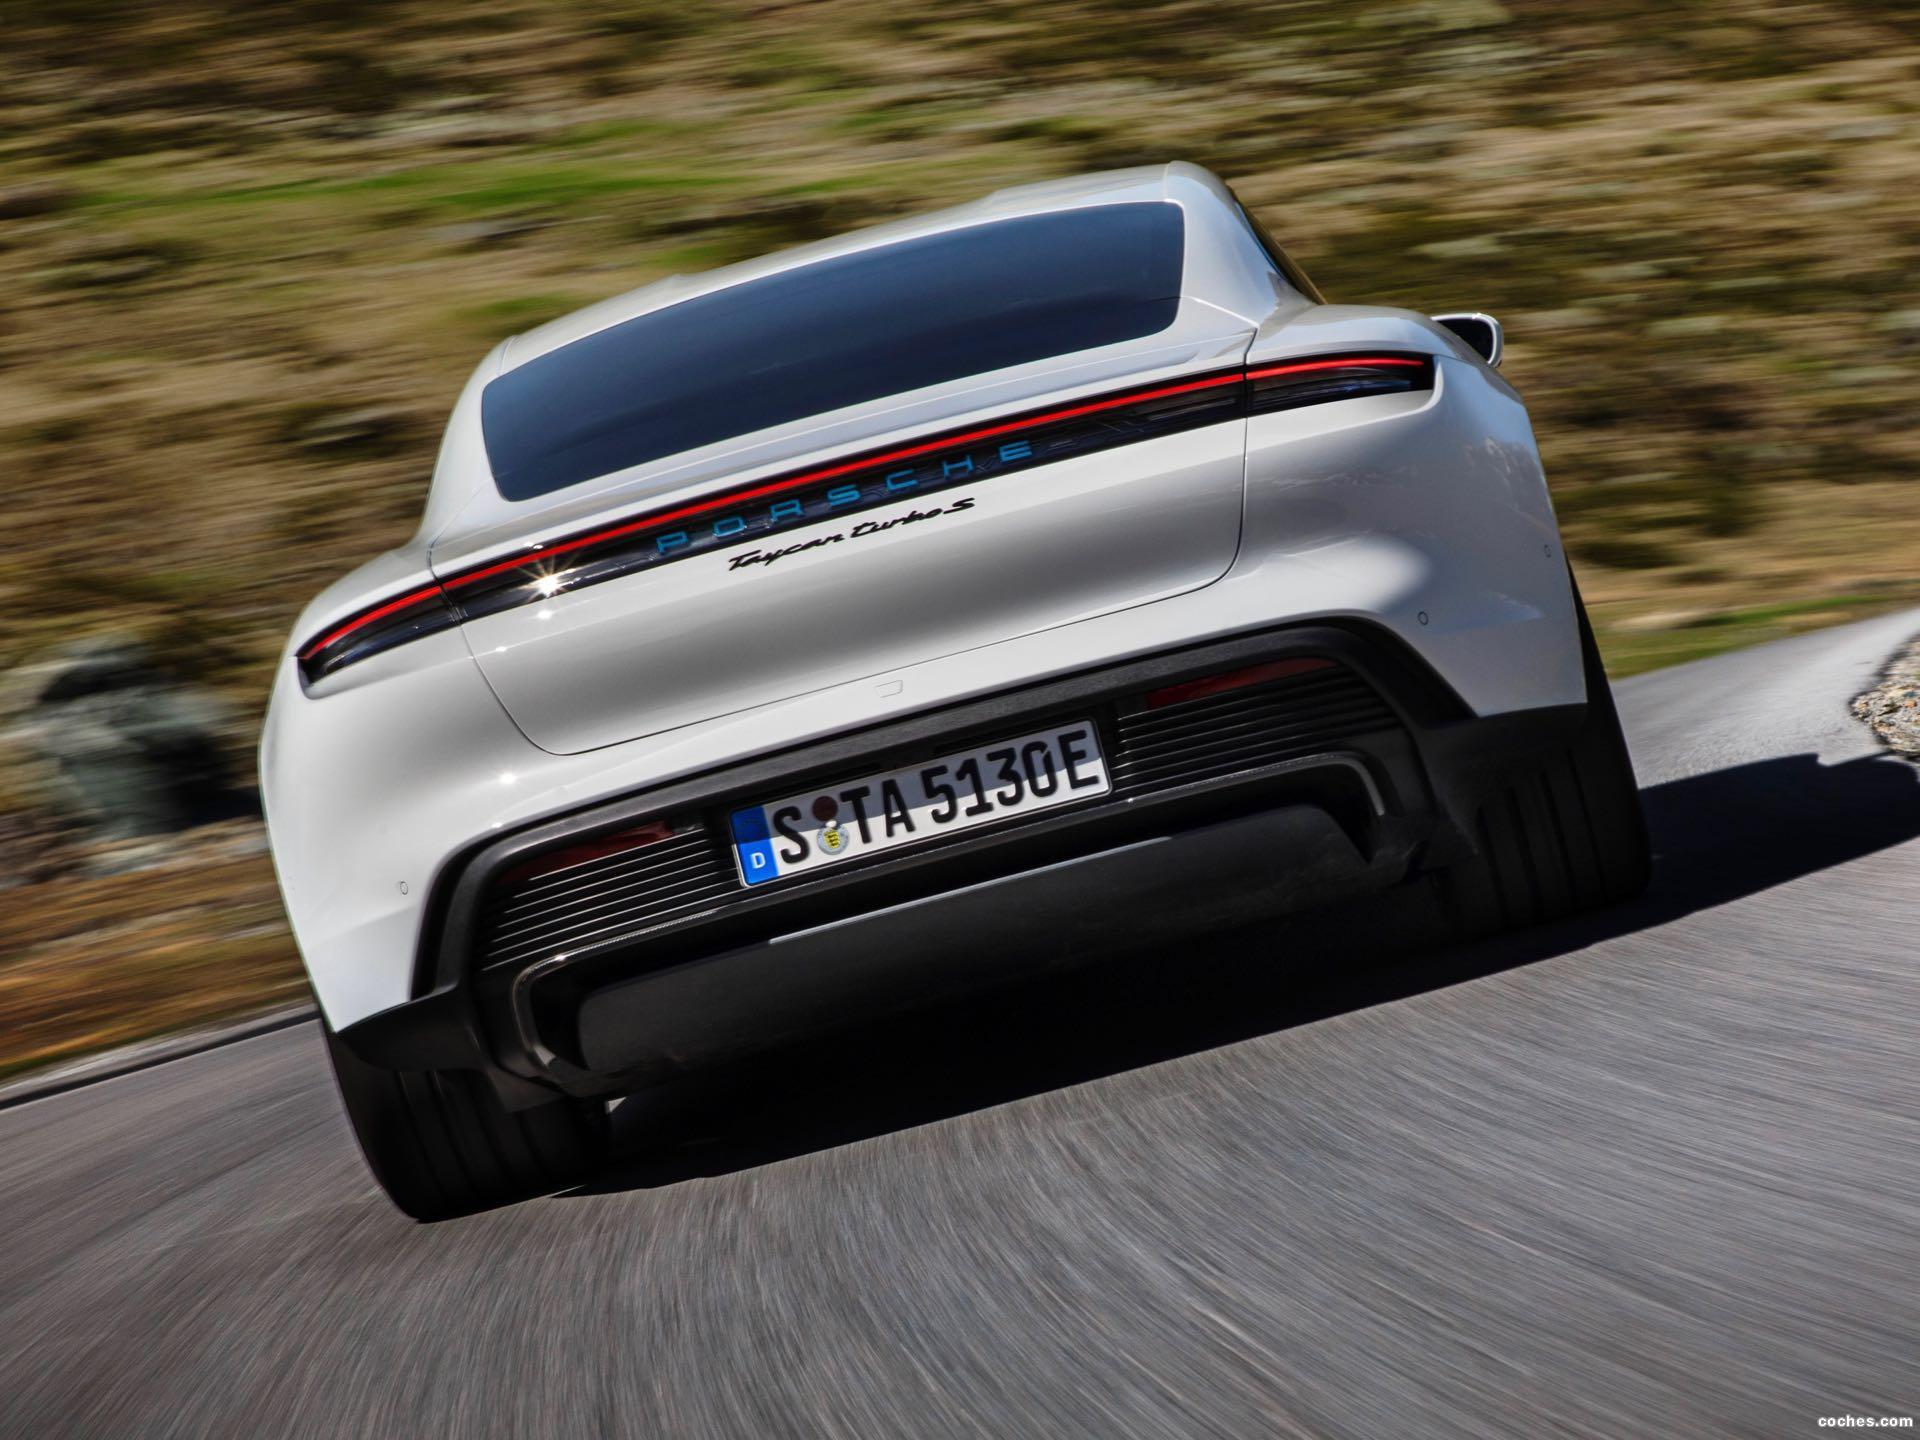 Foto 4 de Porsche Taycan Turbo S 2019